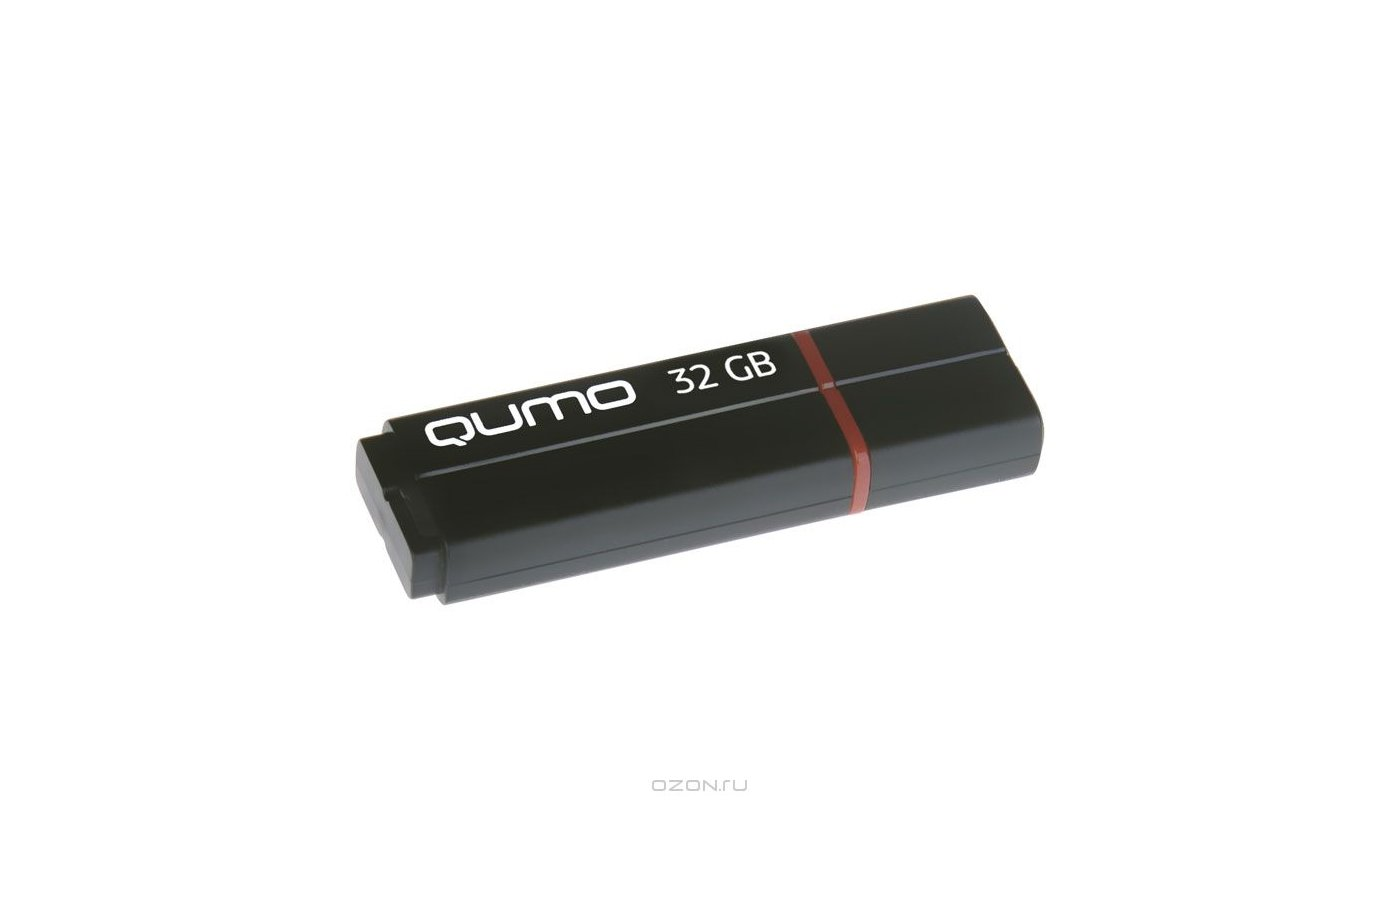 Флеш-диск USB 3.0 QUMO 32GB SPEEDSTER